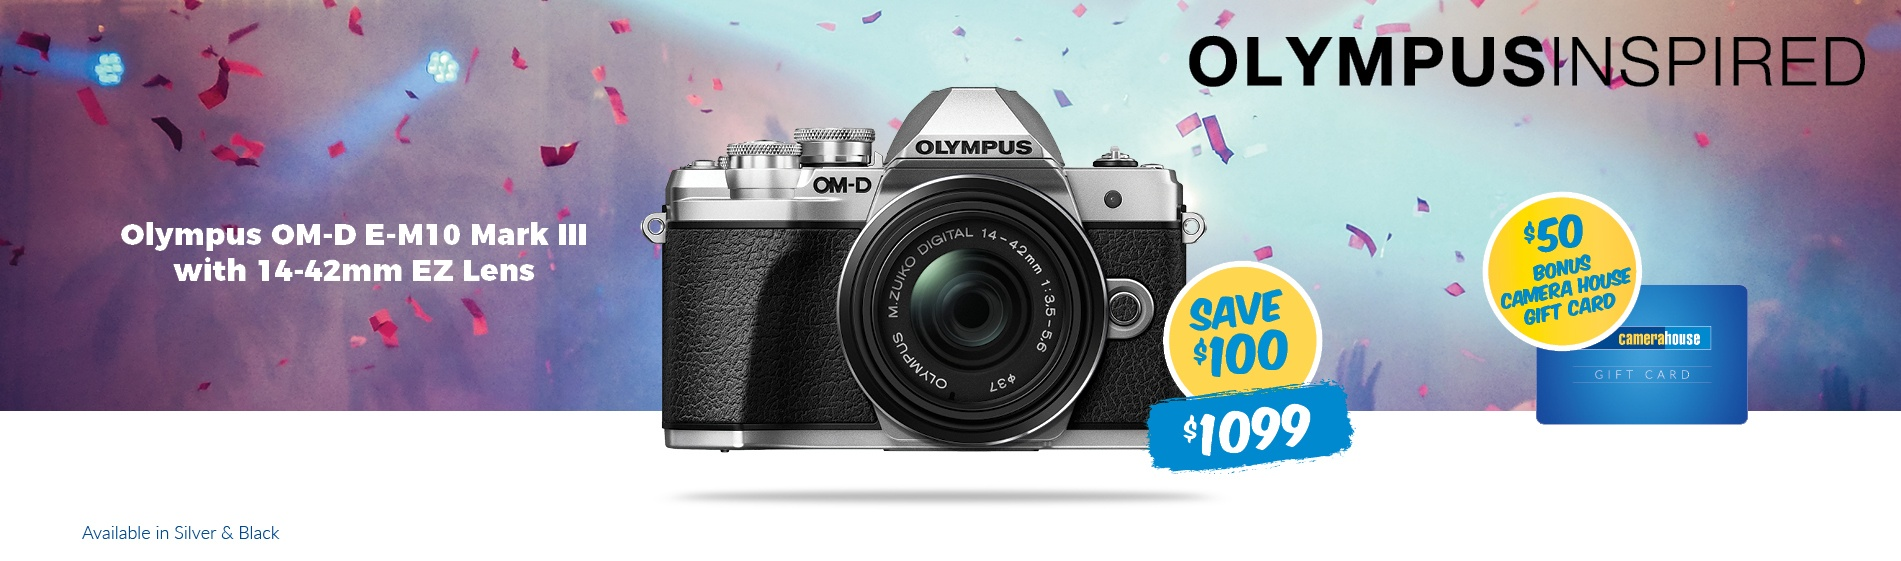 092018_1_Olympus_Catalogue_DesktopCarousel4